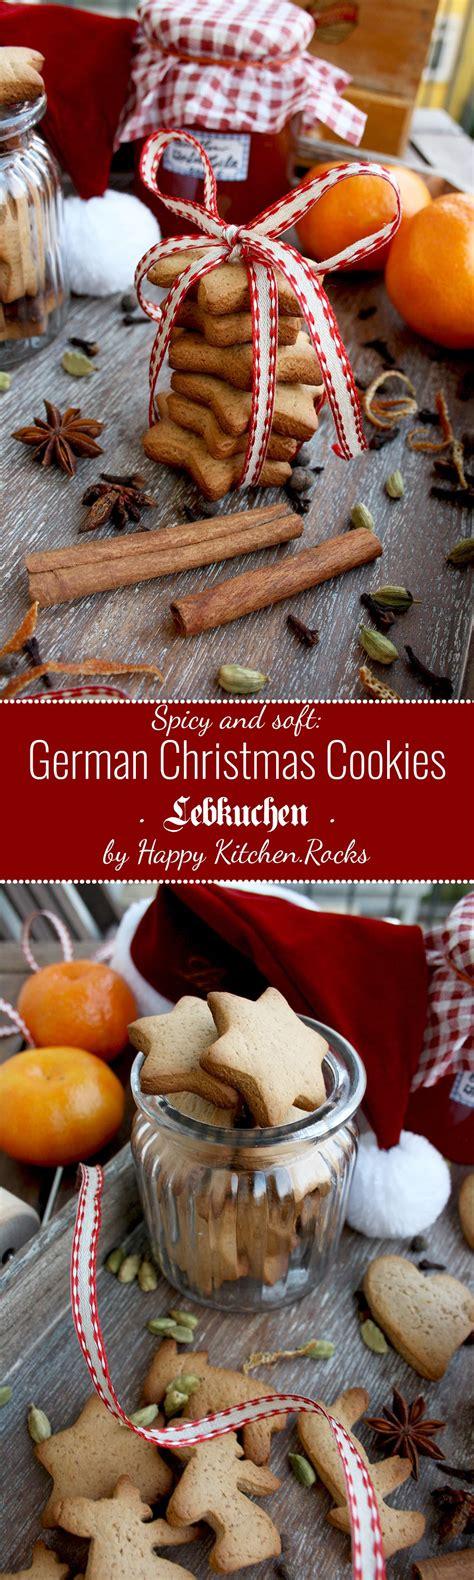 german christmas gift baskets german cookies lebkuchen happy kitchen rocks